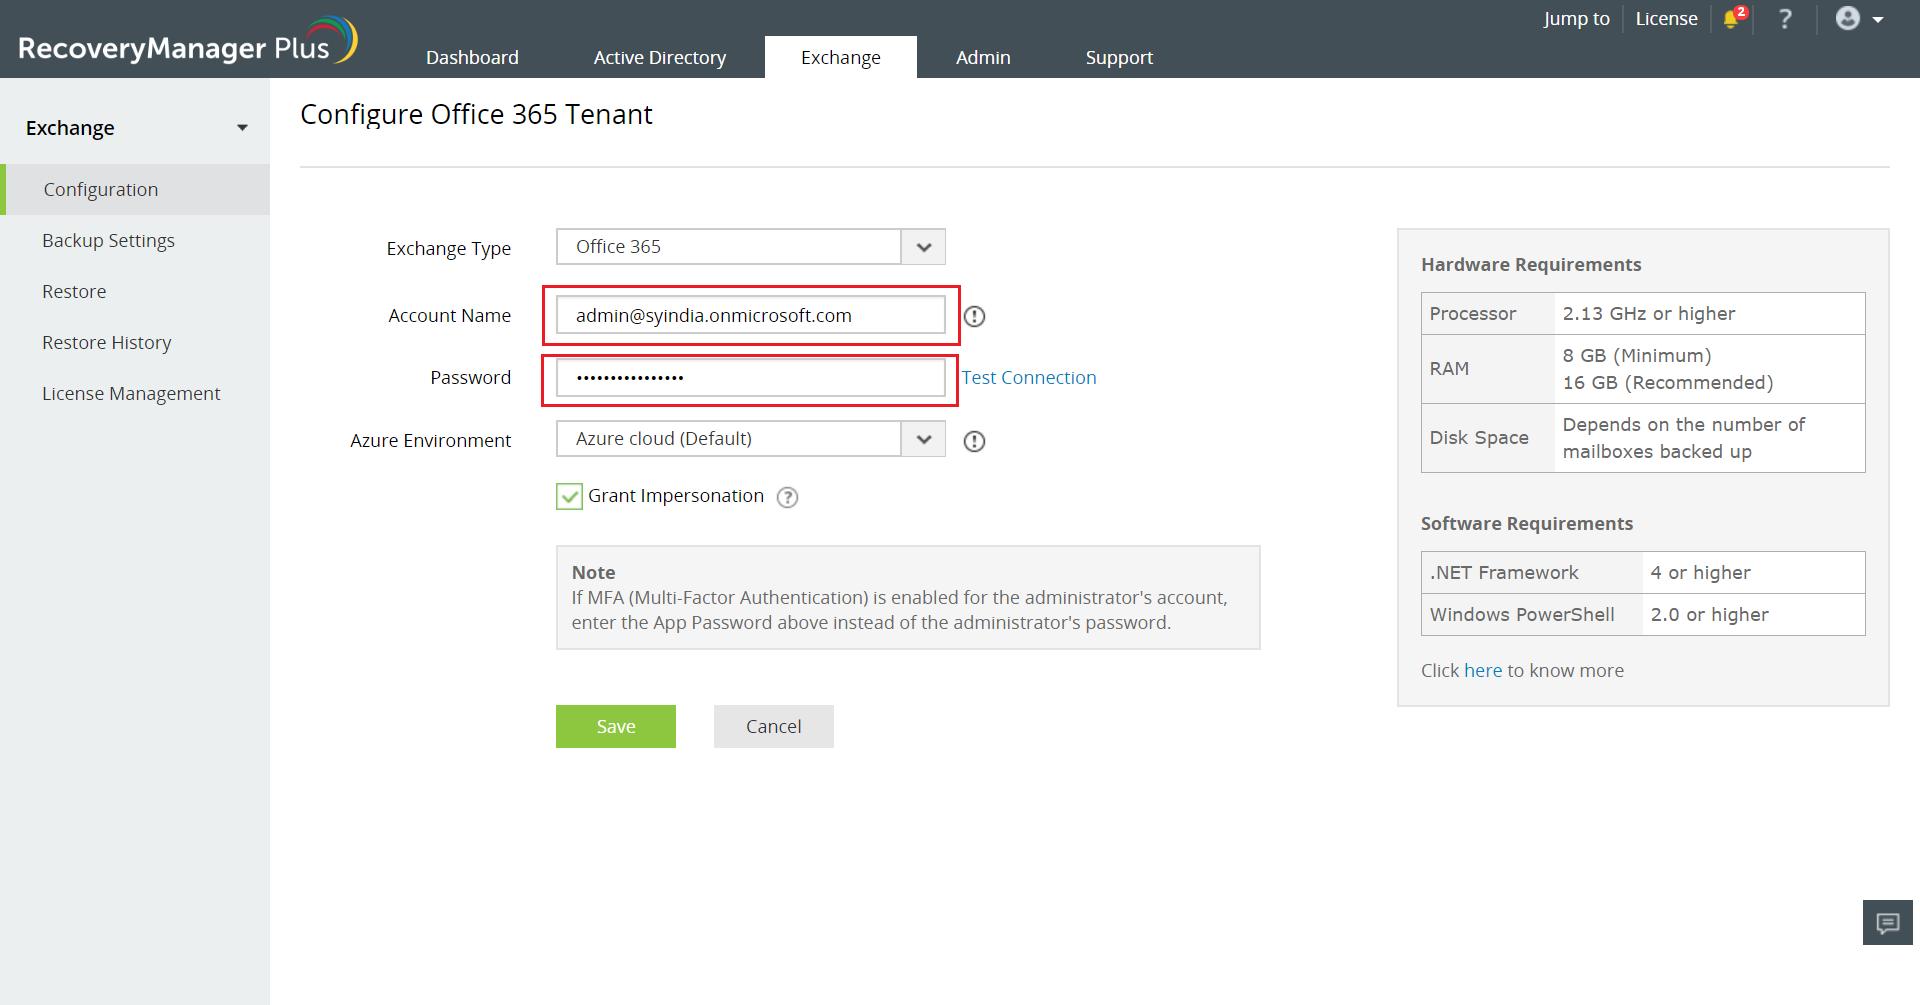 configure-office-365-tenant-using-app-password8